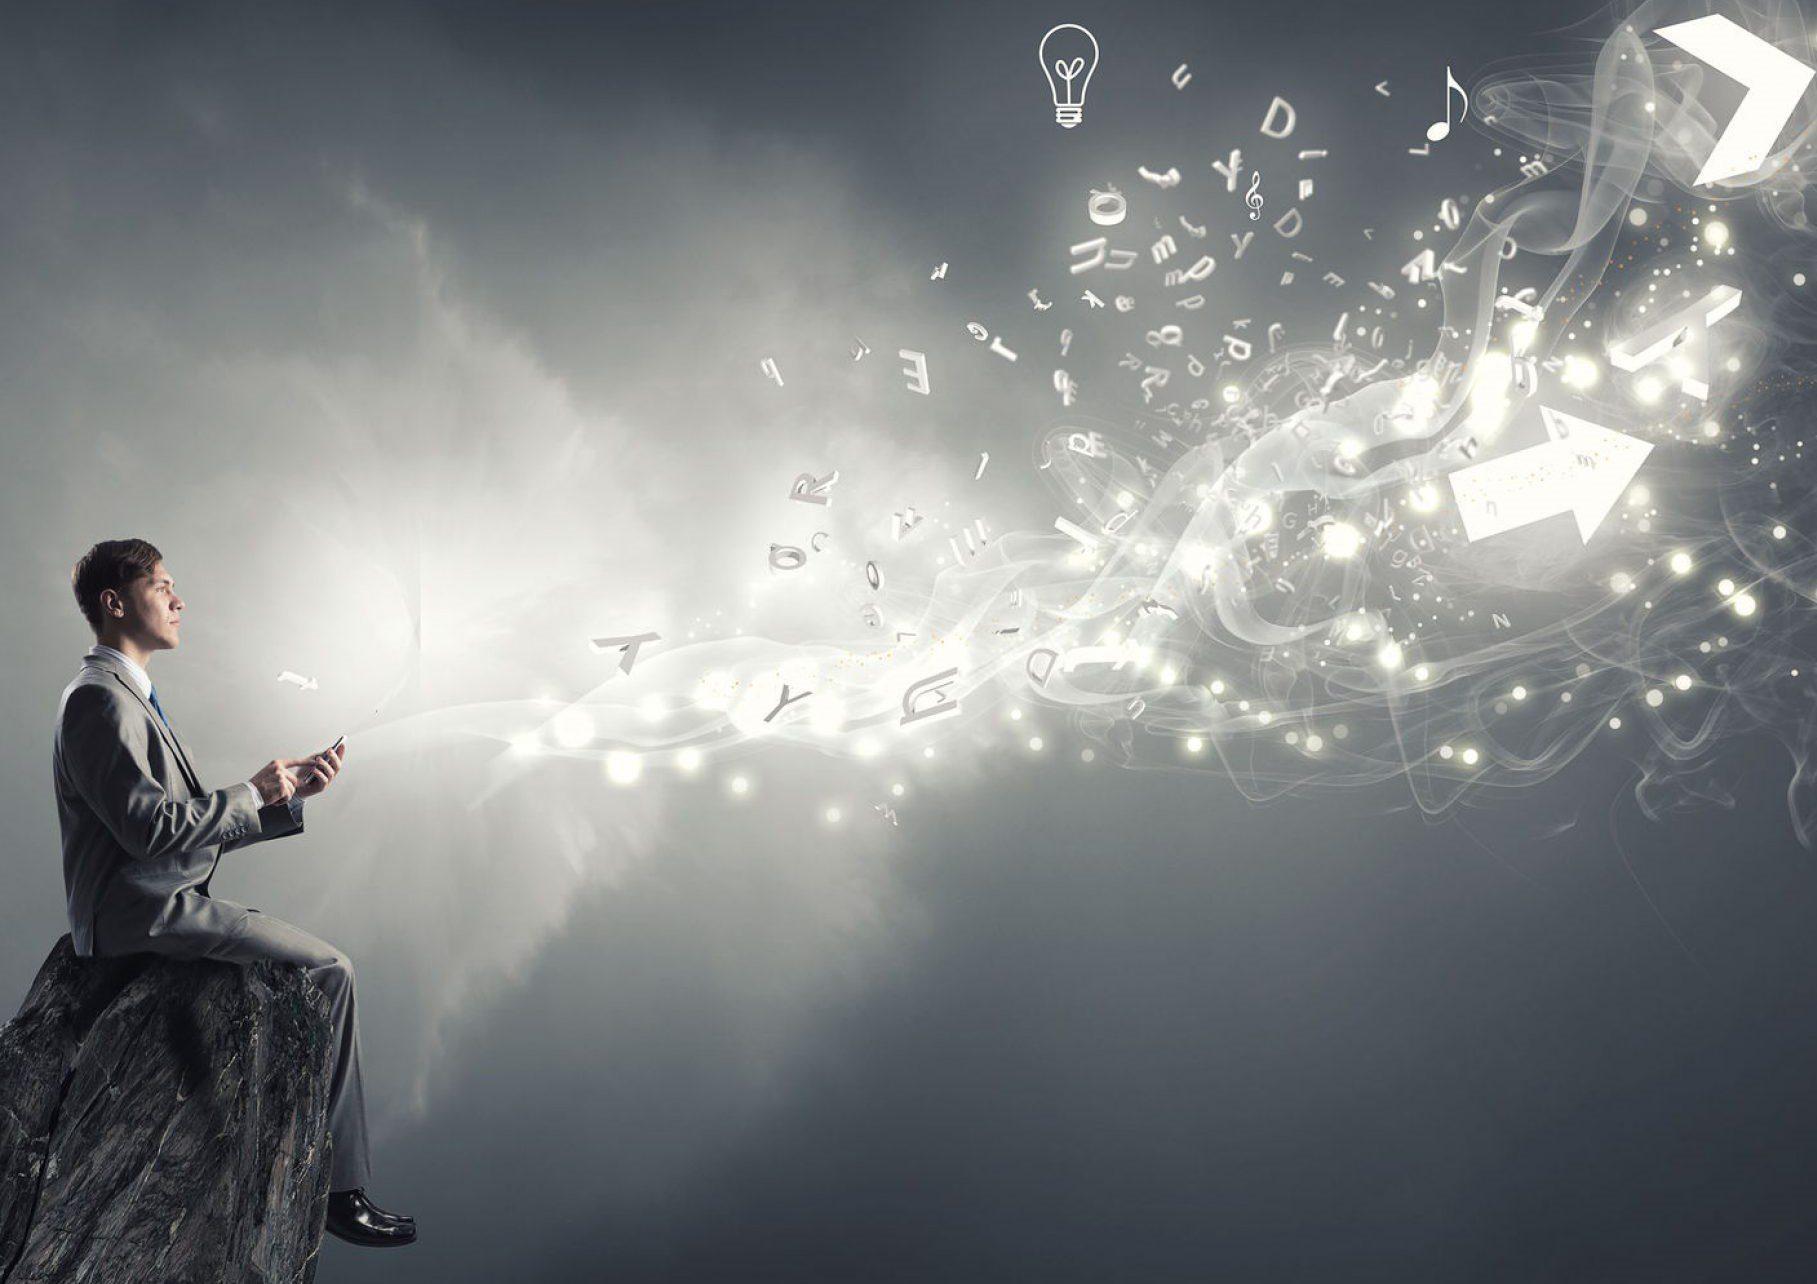 Tech Buyers Choose: Innovative Startup vs. Experienced Large Vendor